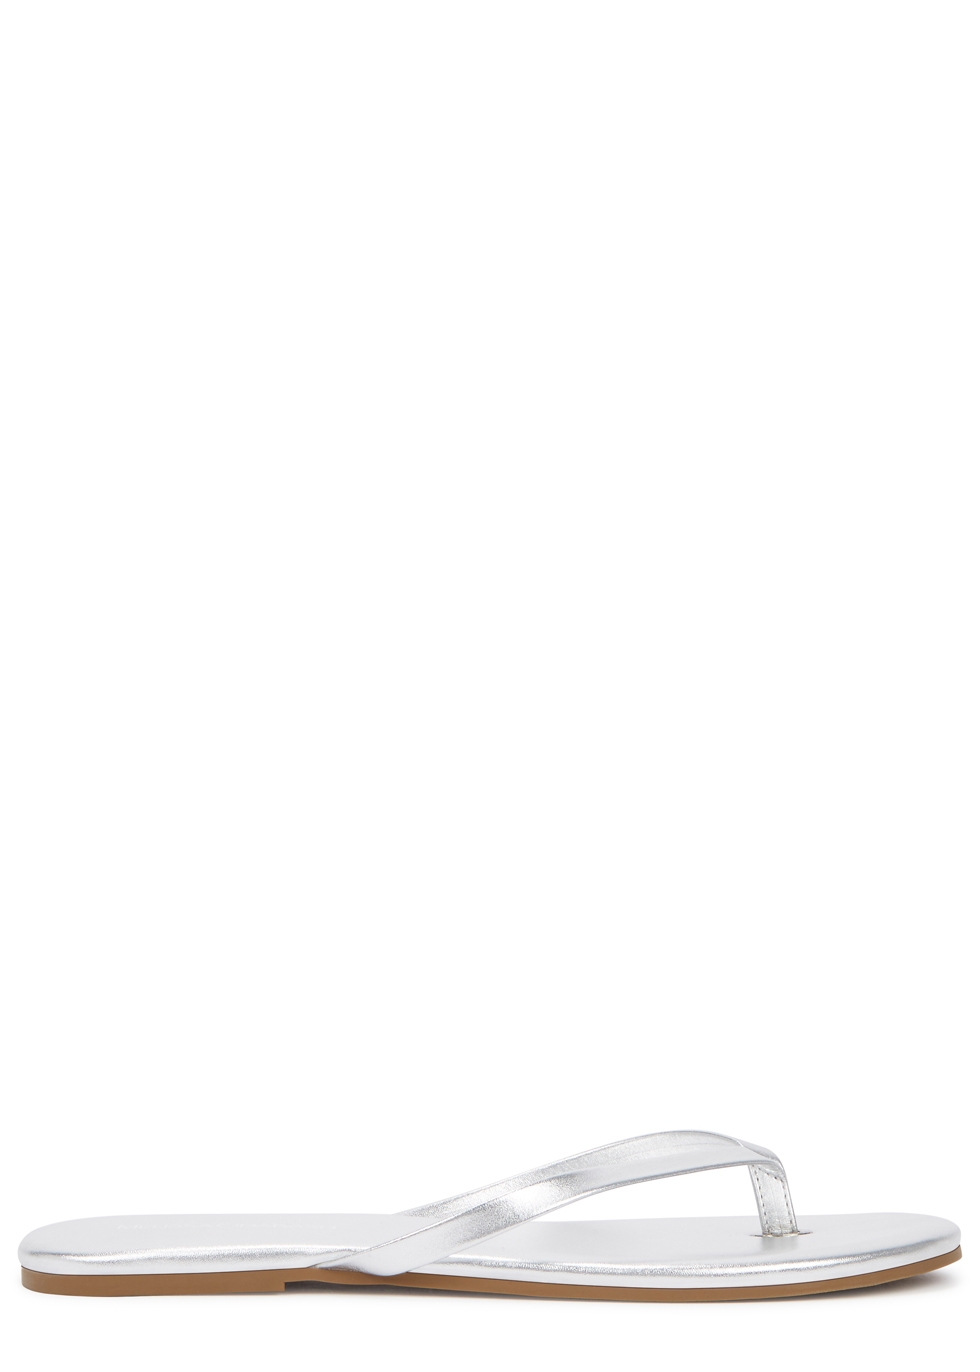 7e3bf3fd6 Melissa Odabash Silver leather sandals - Harvey Nichols